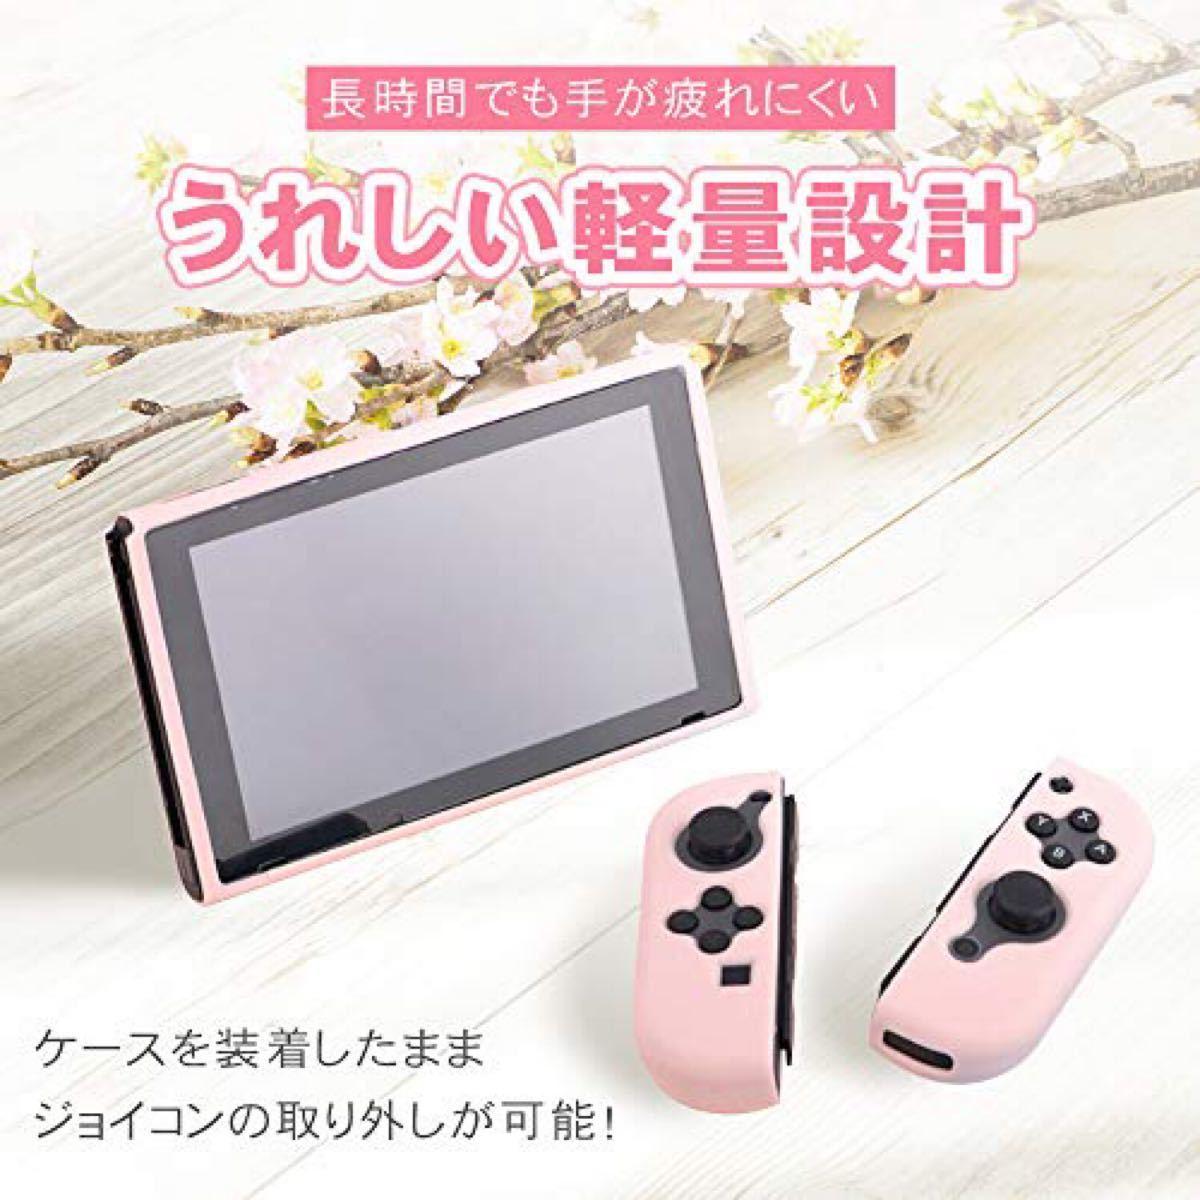 【switchケース】任天堂スイッチ 防水 全面保護カバー ソフト 衝撃吸収 ニンテンドー スイッチ Nintendo